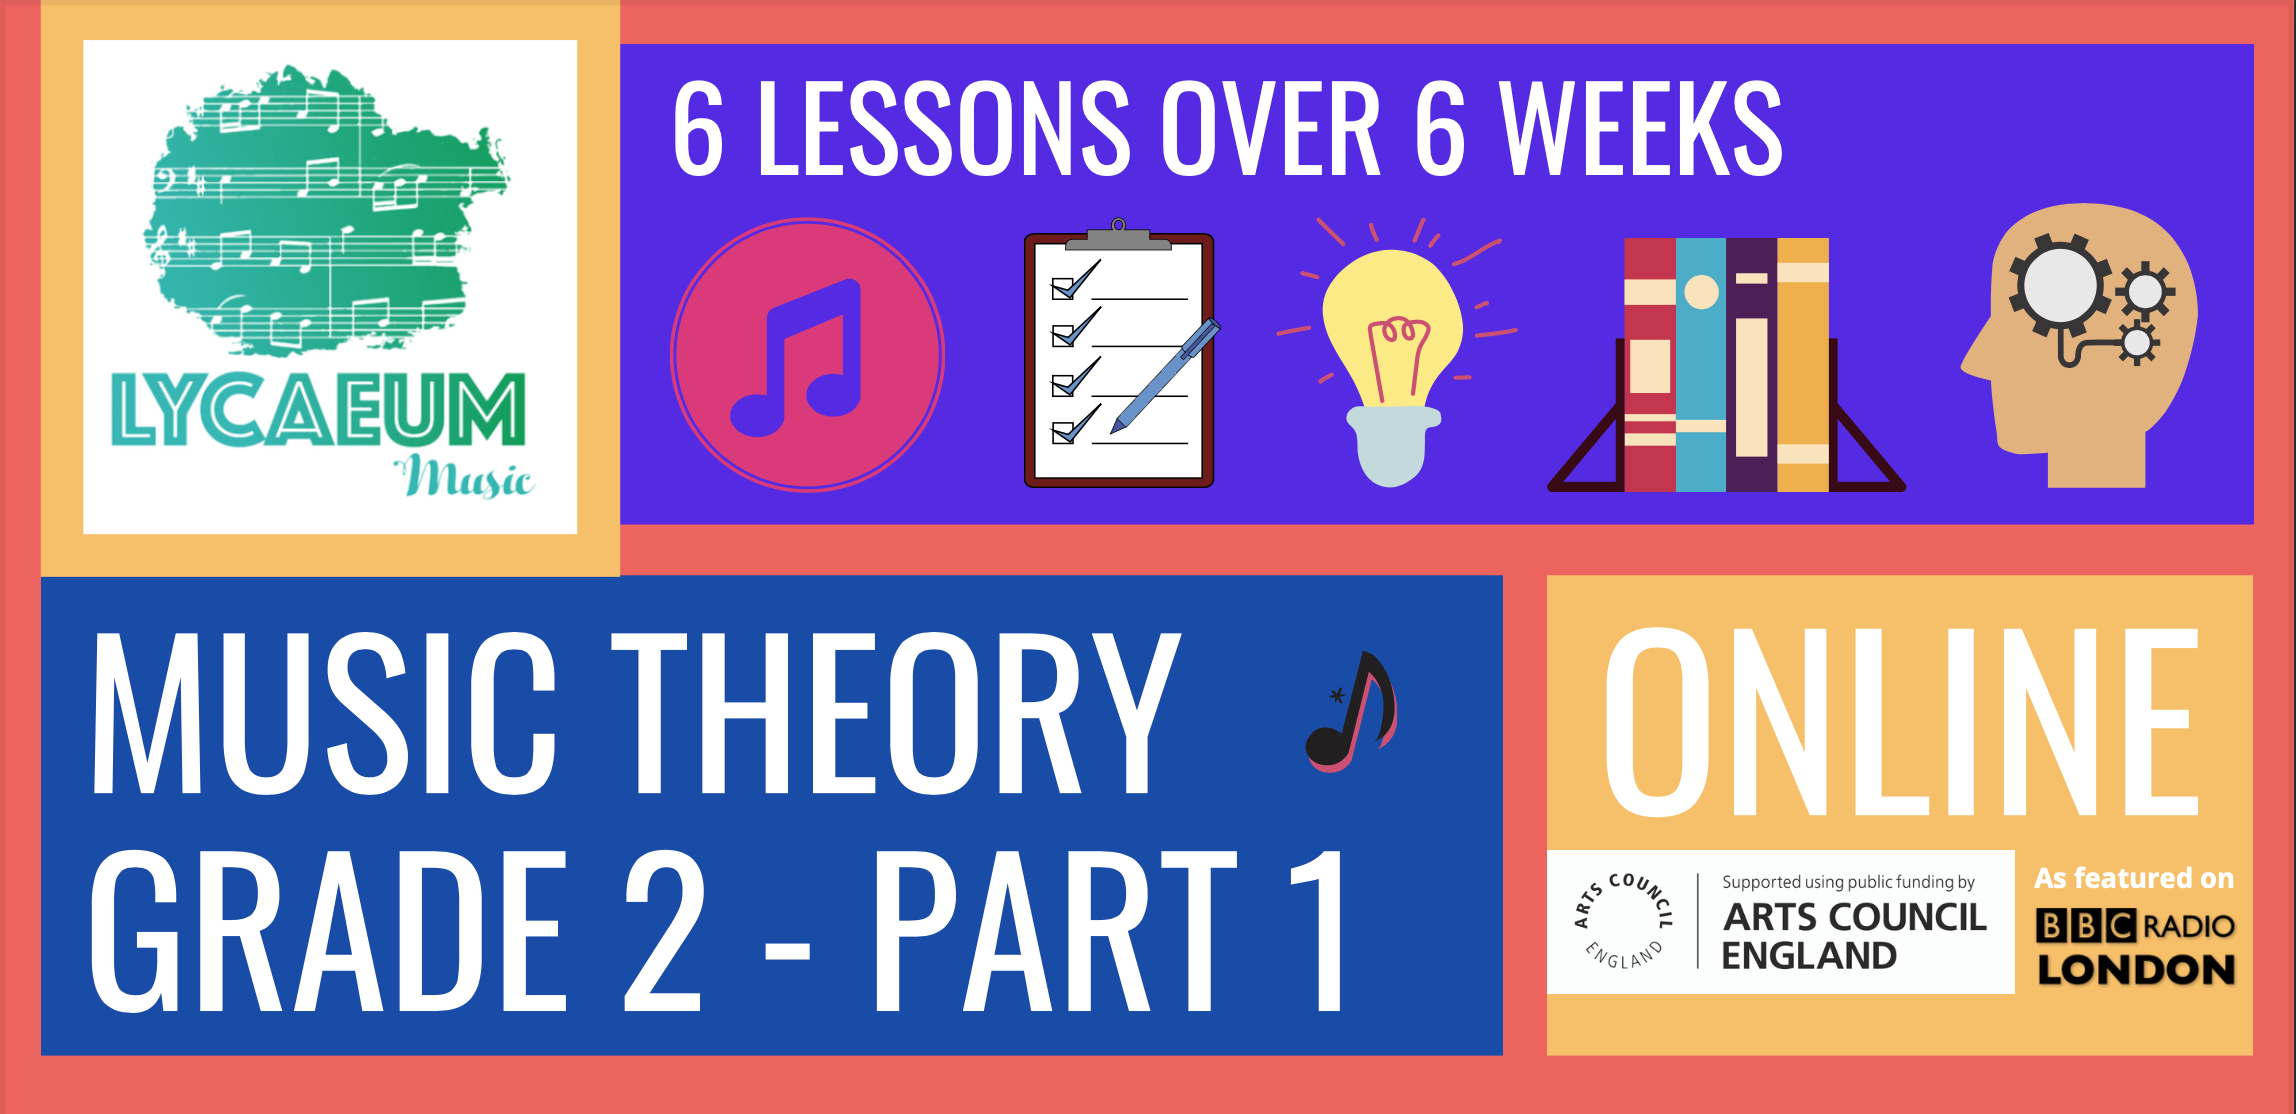 abrsm music theory: grade 2, pt.1 (7-9yo) - pick your weekly time slot